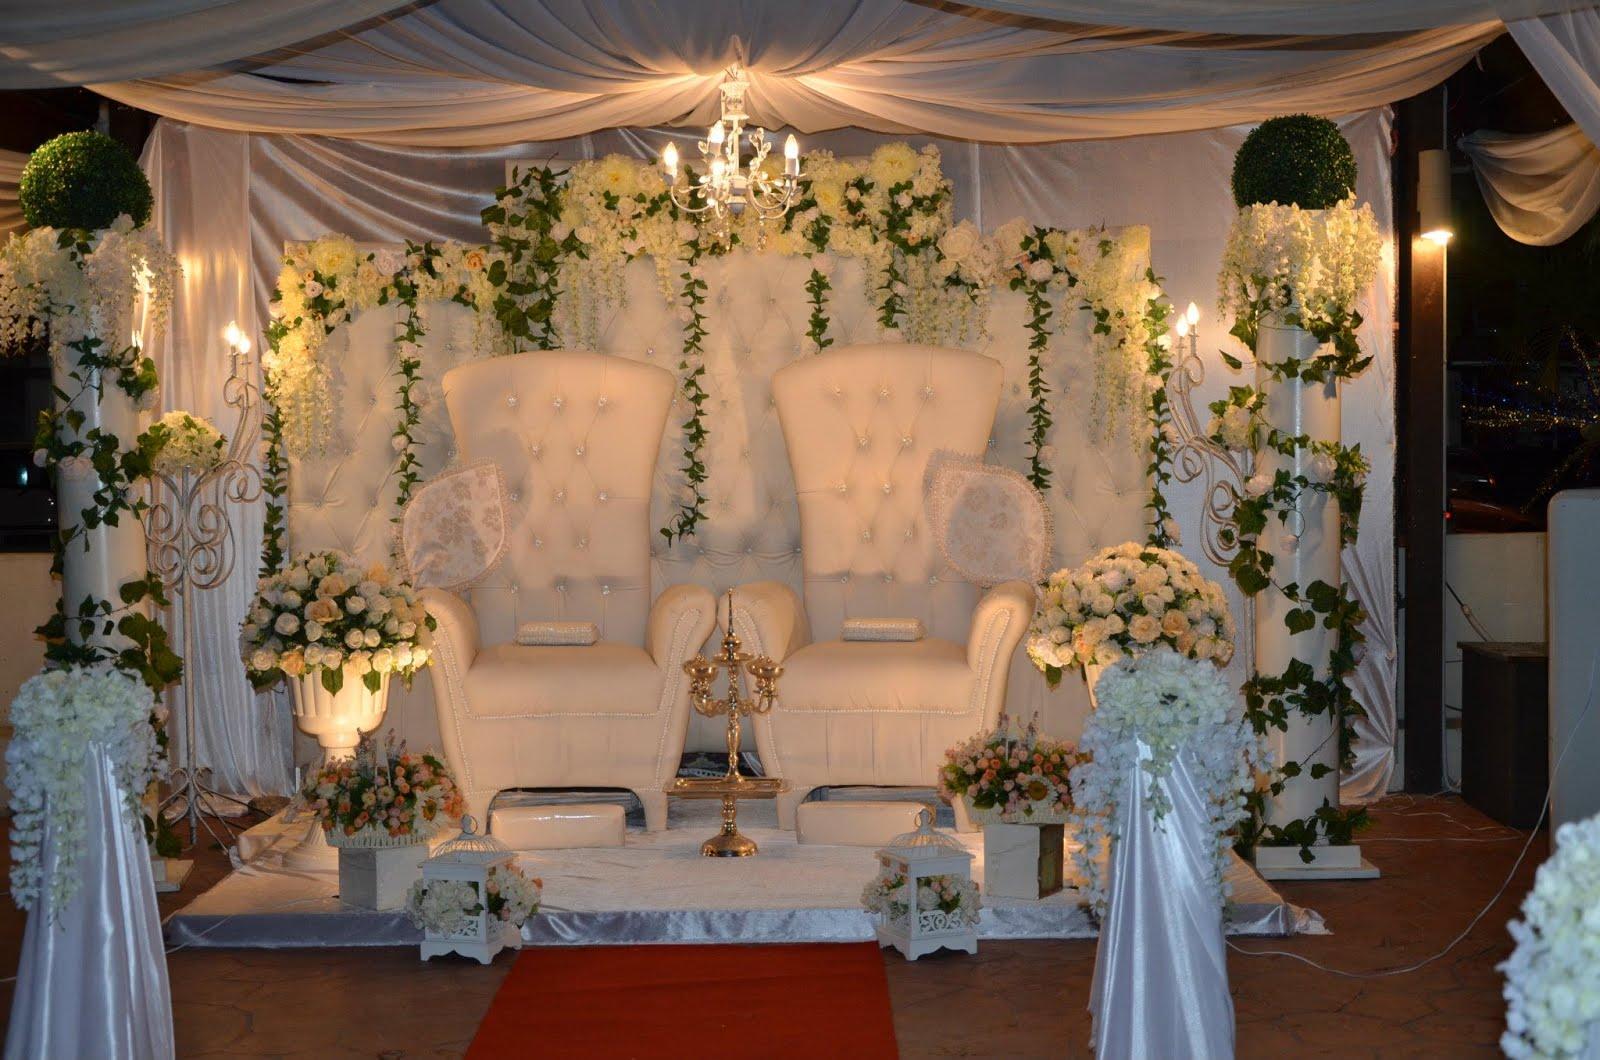 Pelamin chenta wedding